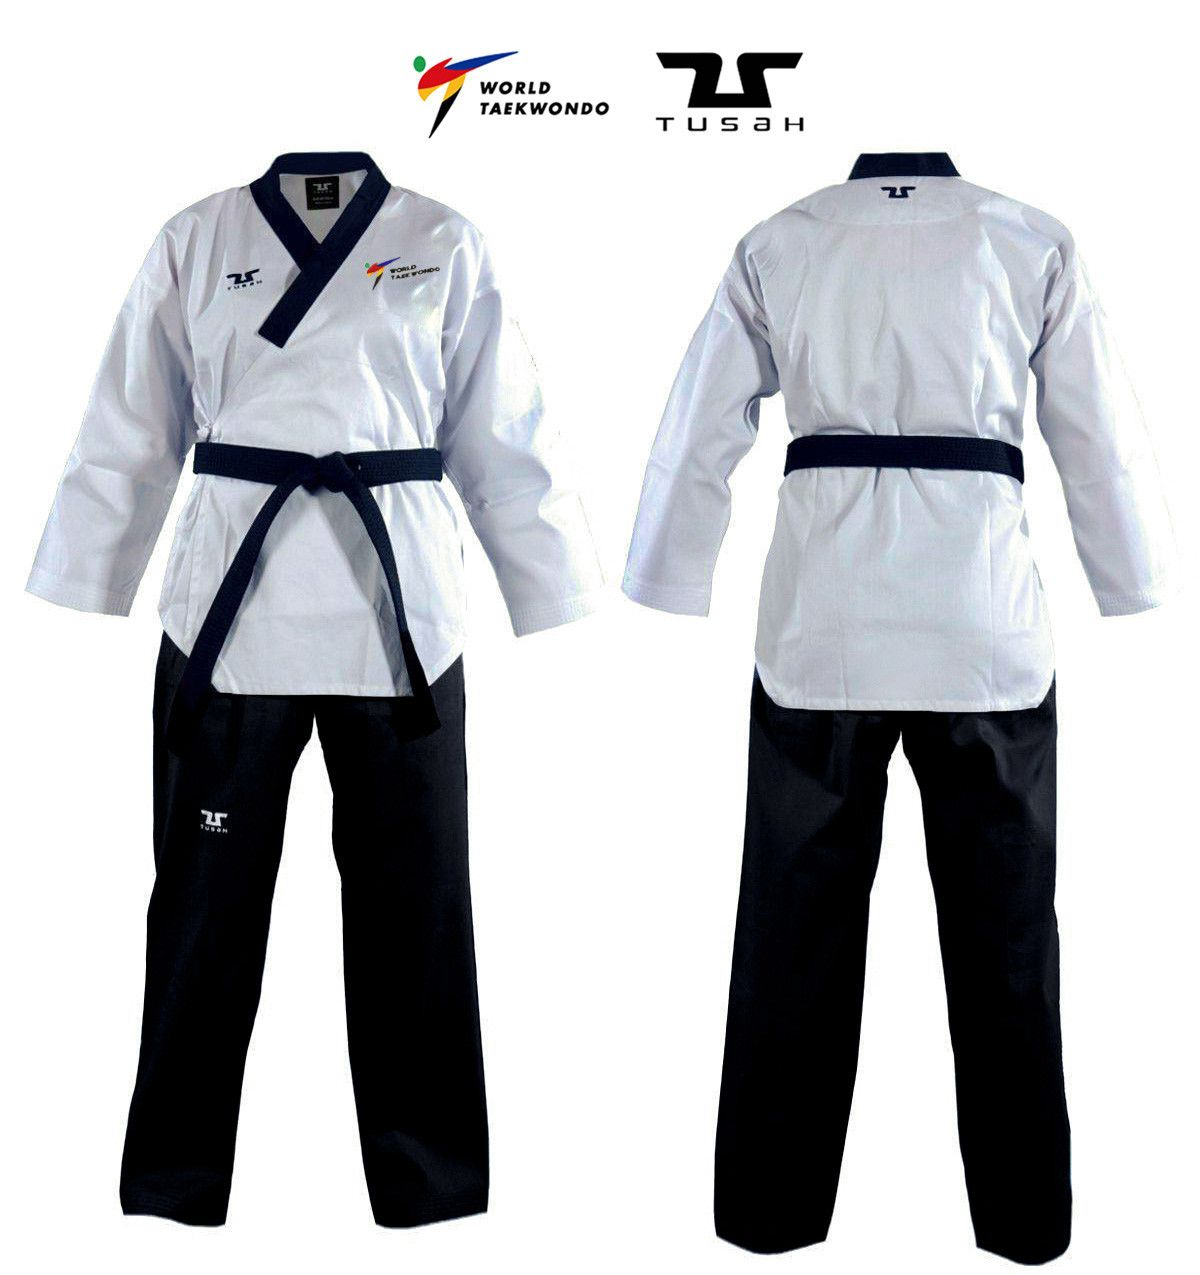 Poomsae Easyfit Dan Maschile Tusah per Taekwondo Omologato WT per forme e competizioni